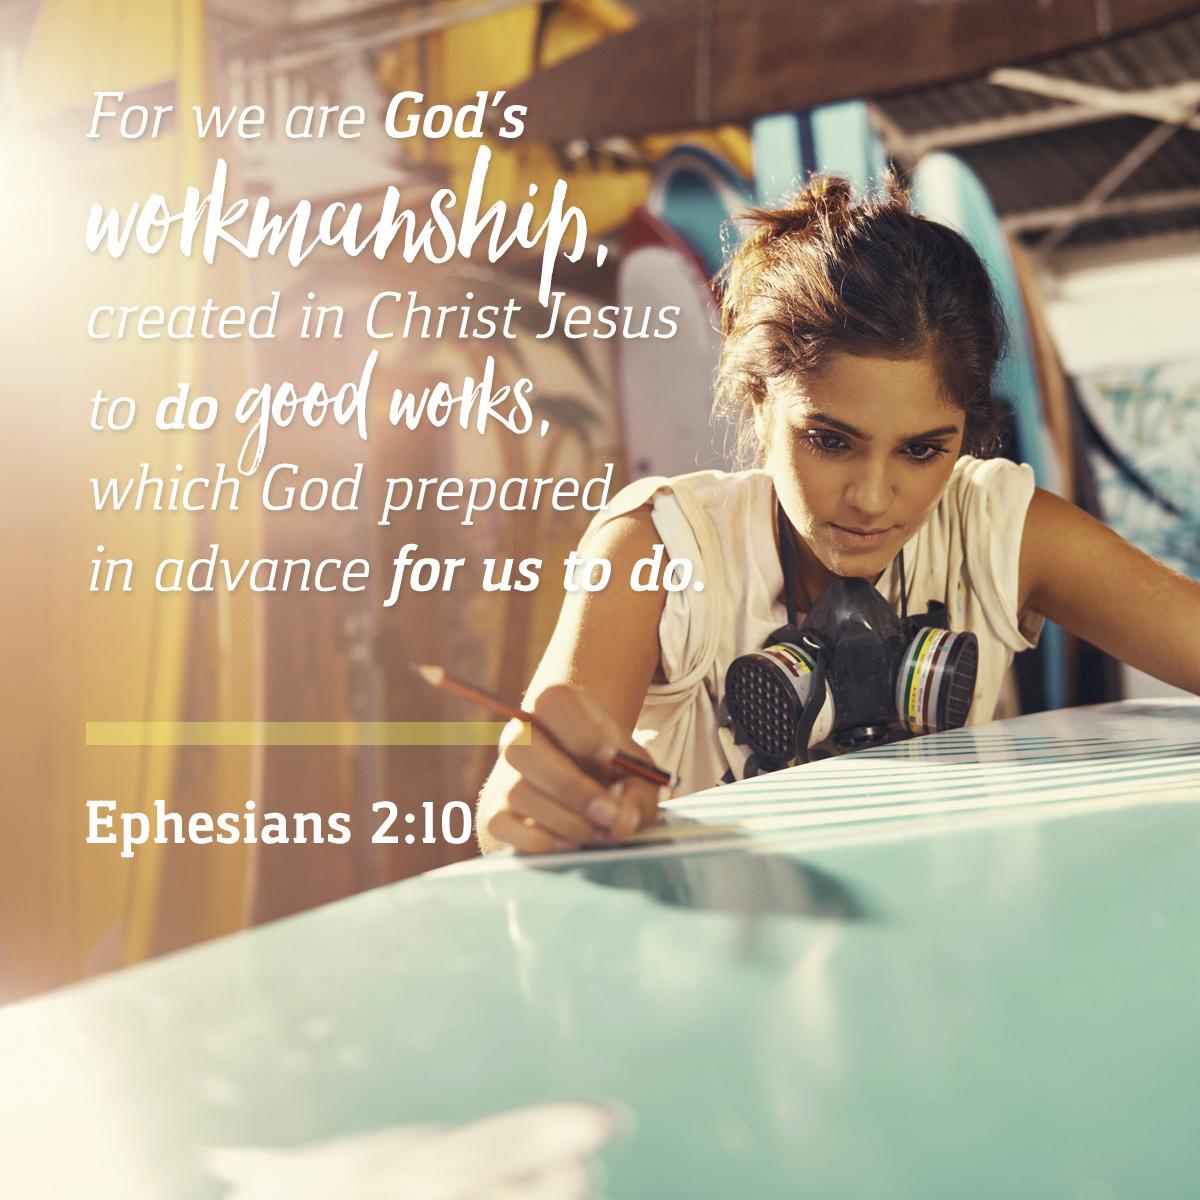 Ephesians 2:10 - Daily Verse